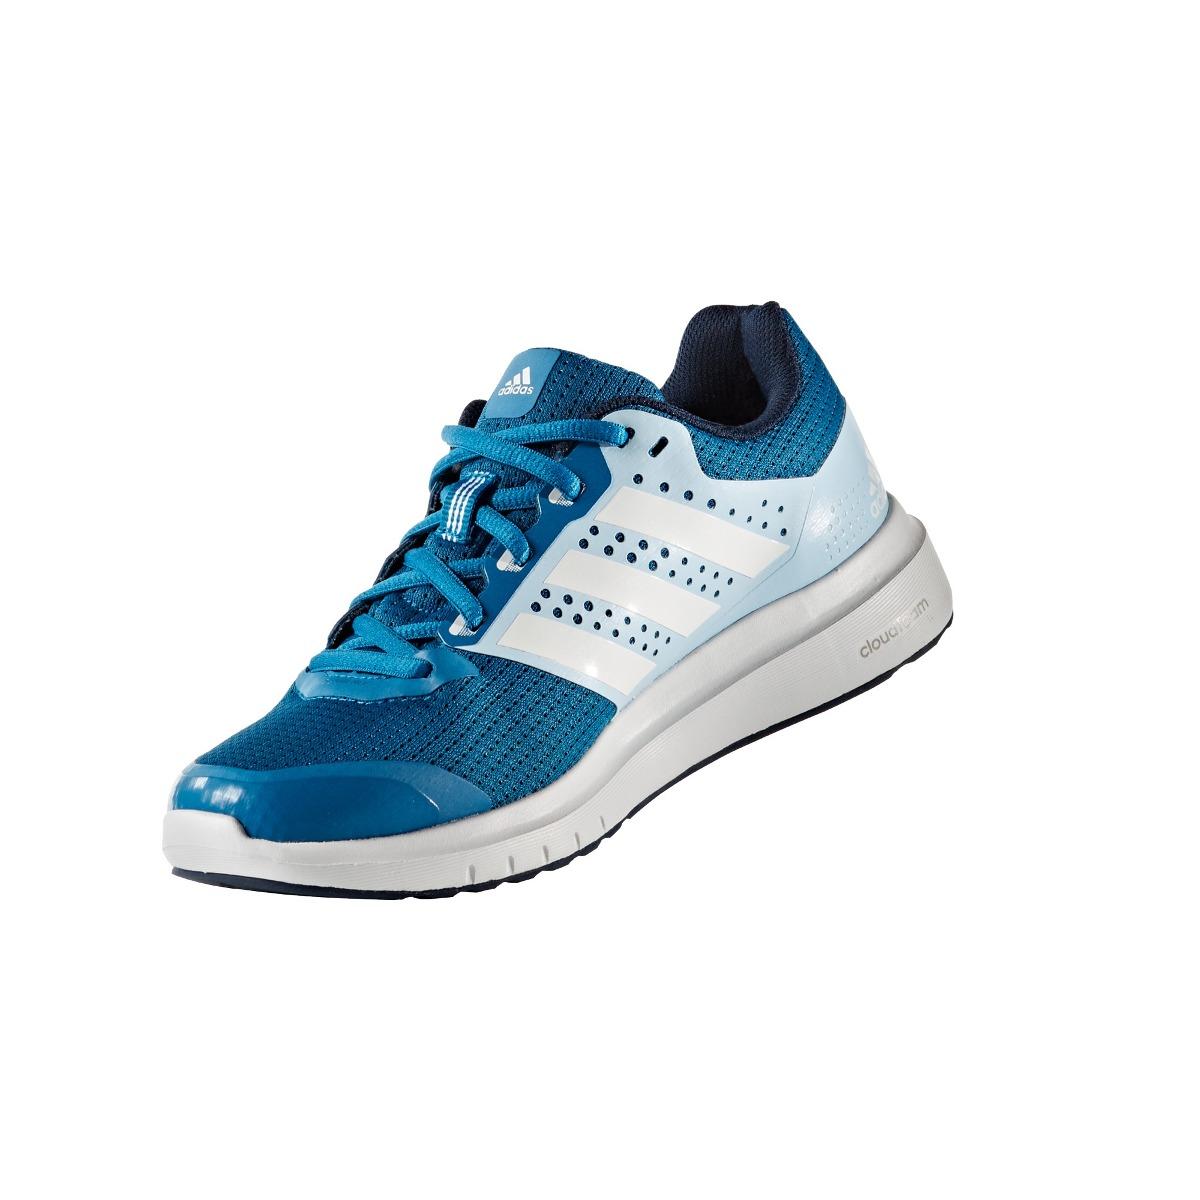 Zapatillas adidas Running Duramo 7 W Mujer Celeste Cblanco